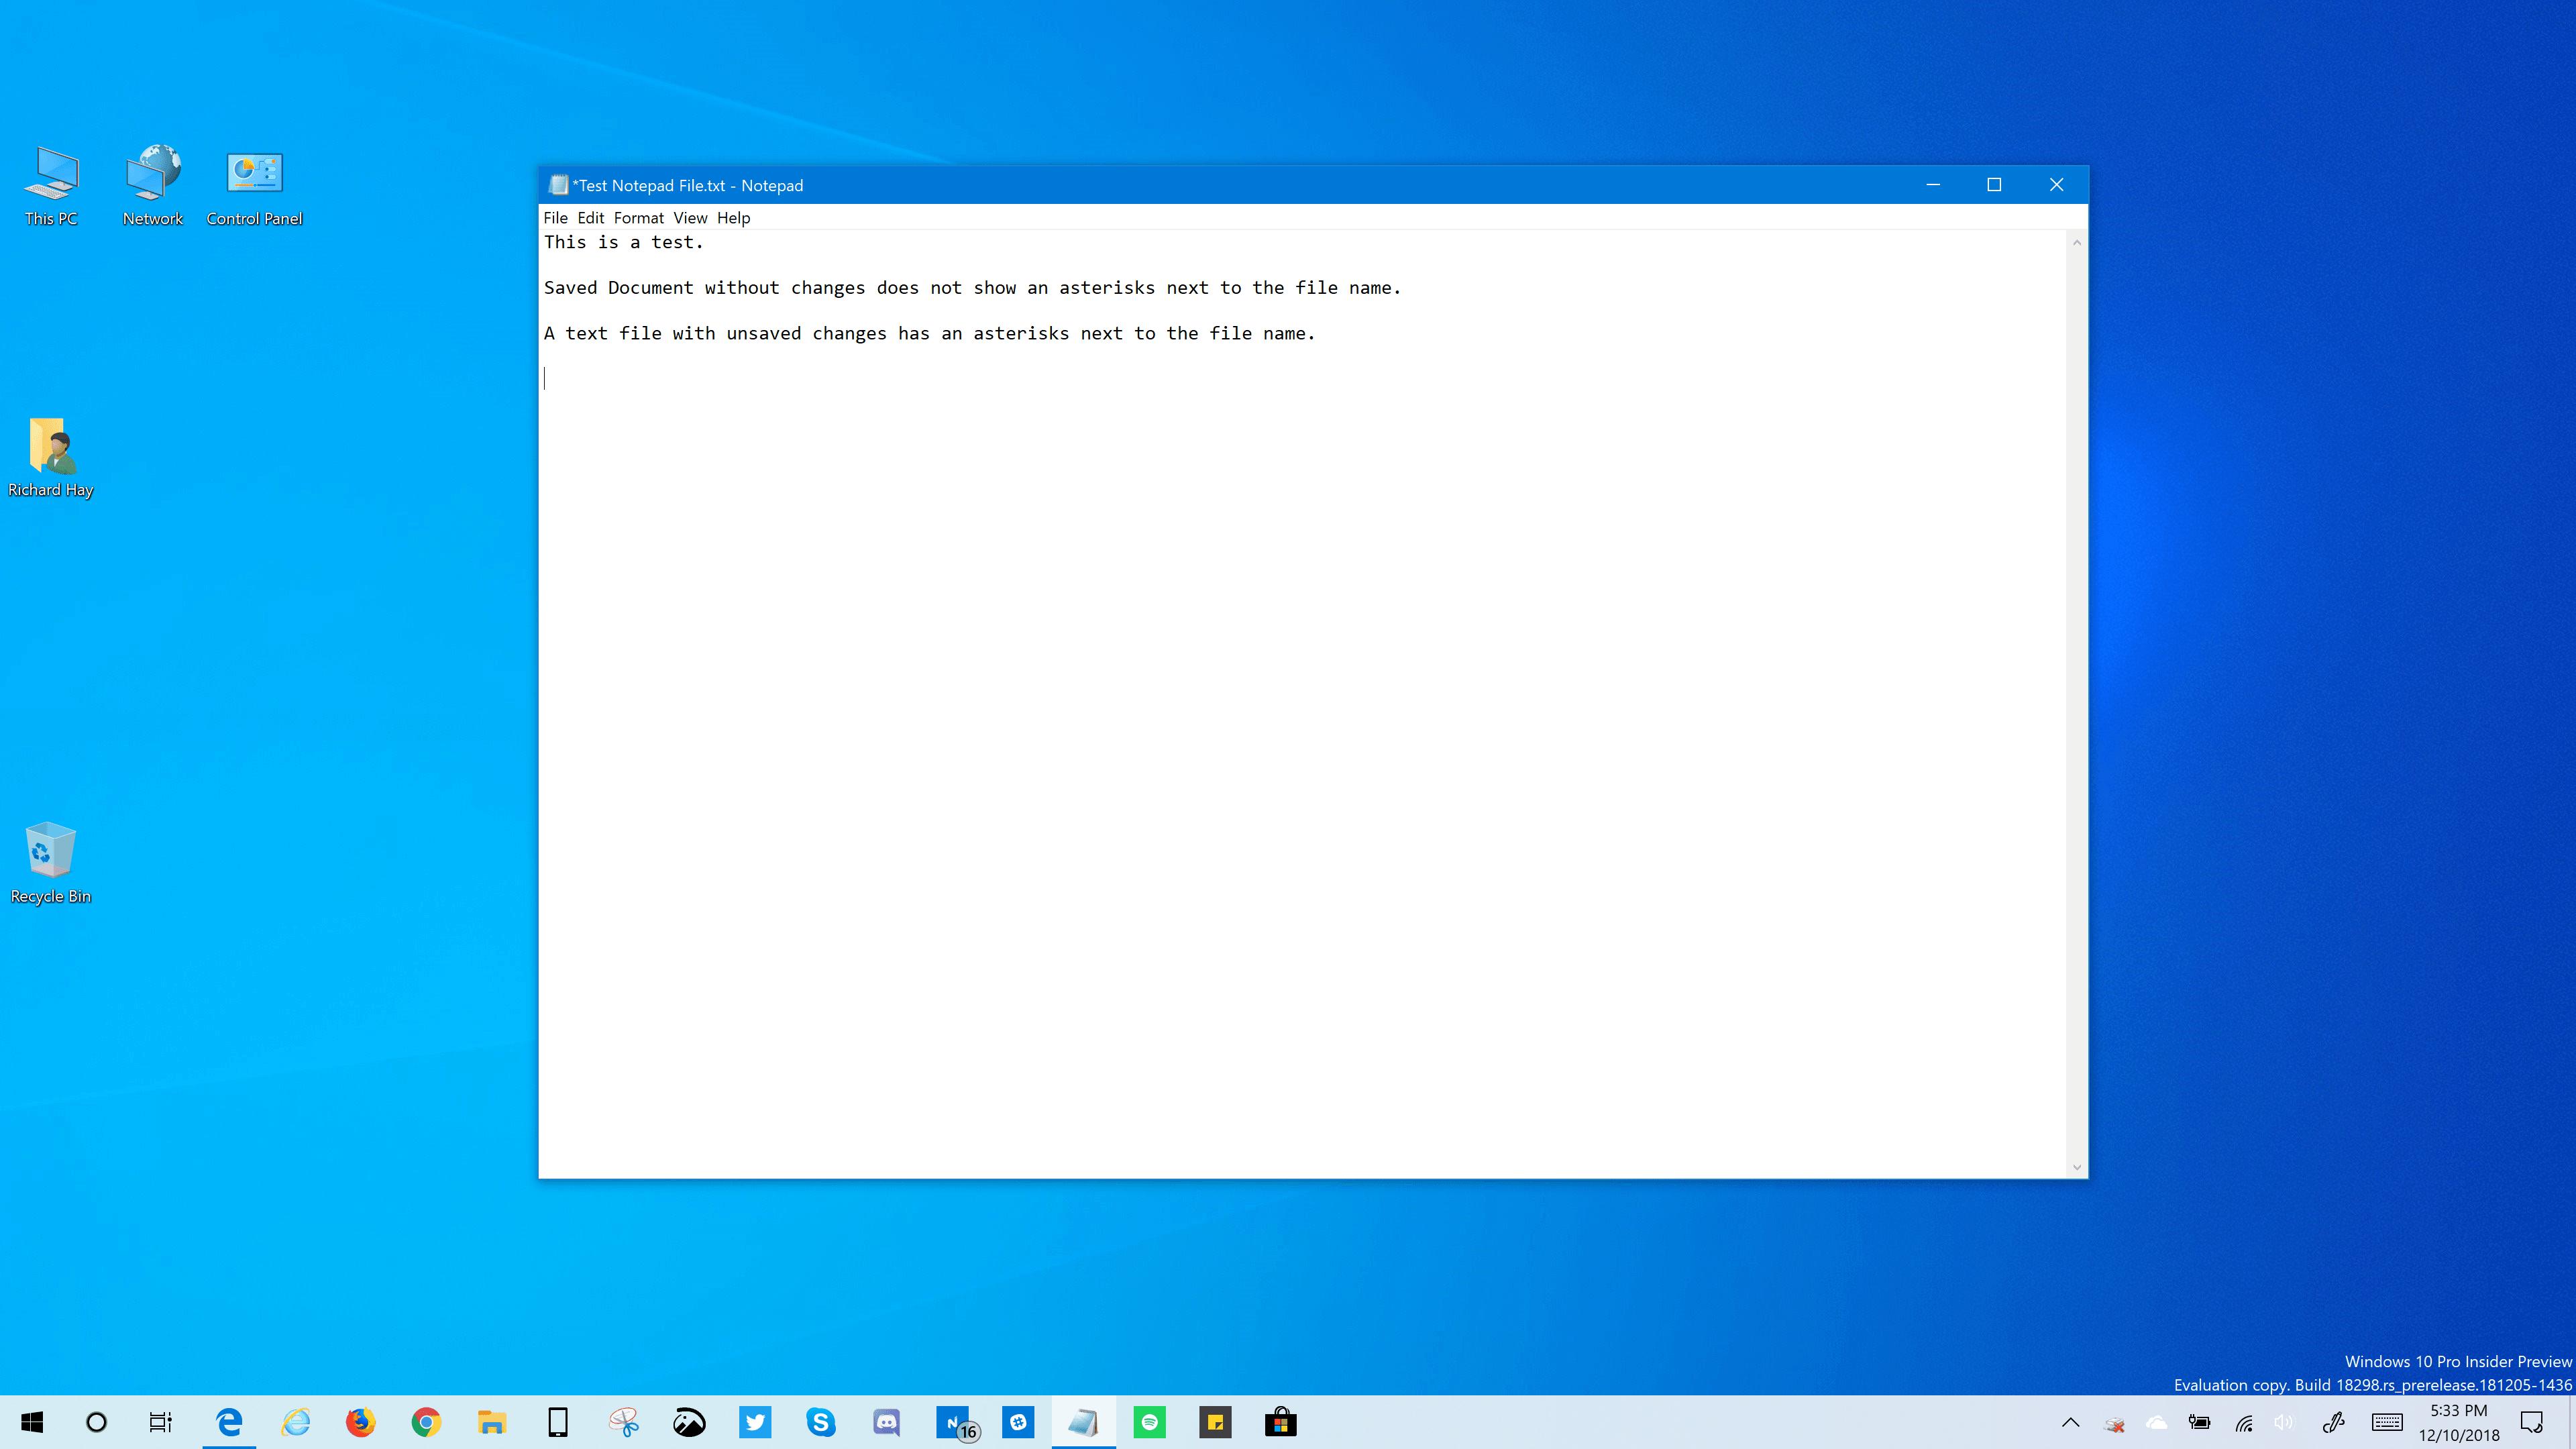 Windows 10 (19H1) Build 18298